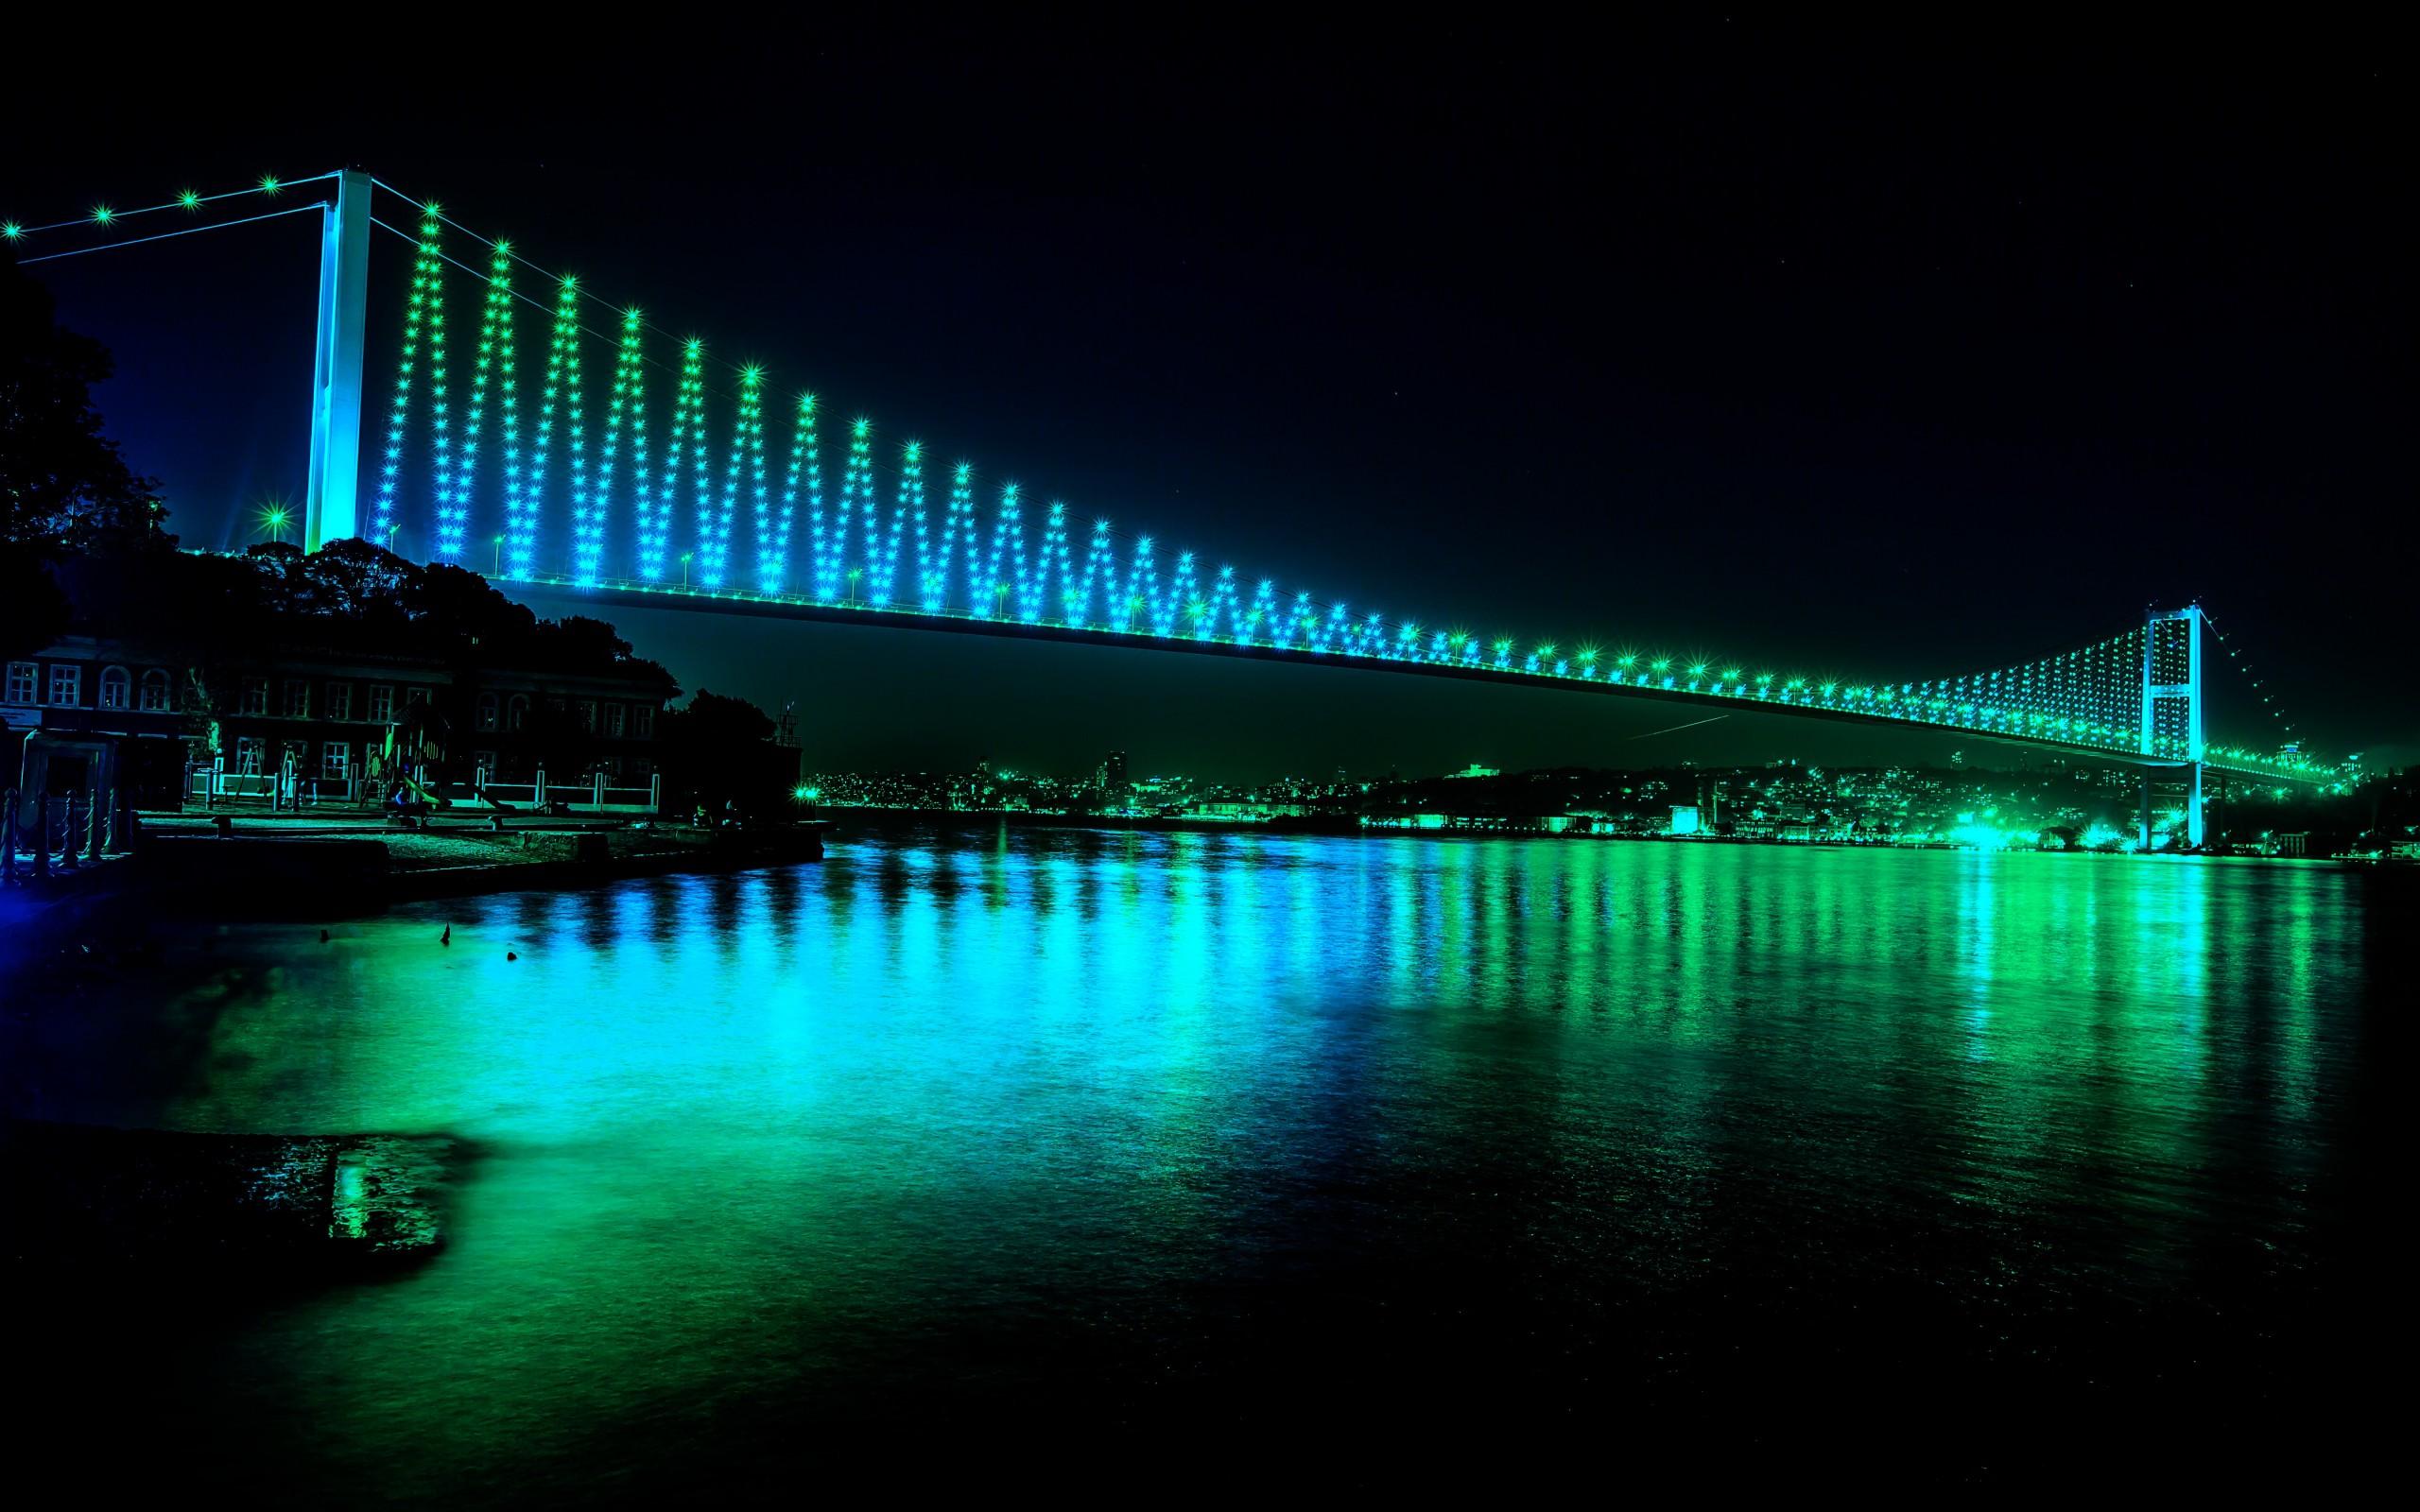 Bosphorus bridge full hd wallpaper and background image - Full hd wallpaper pc download ...